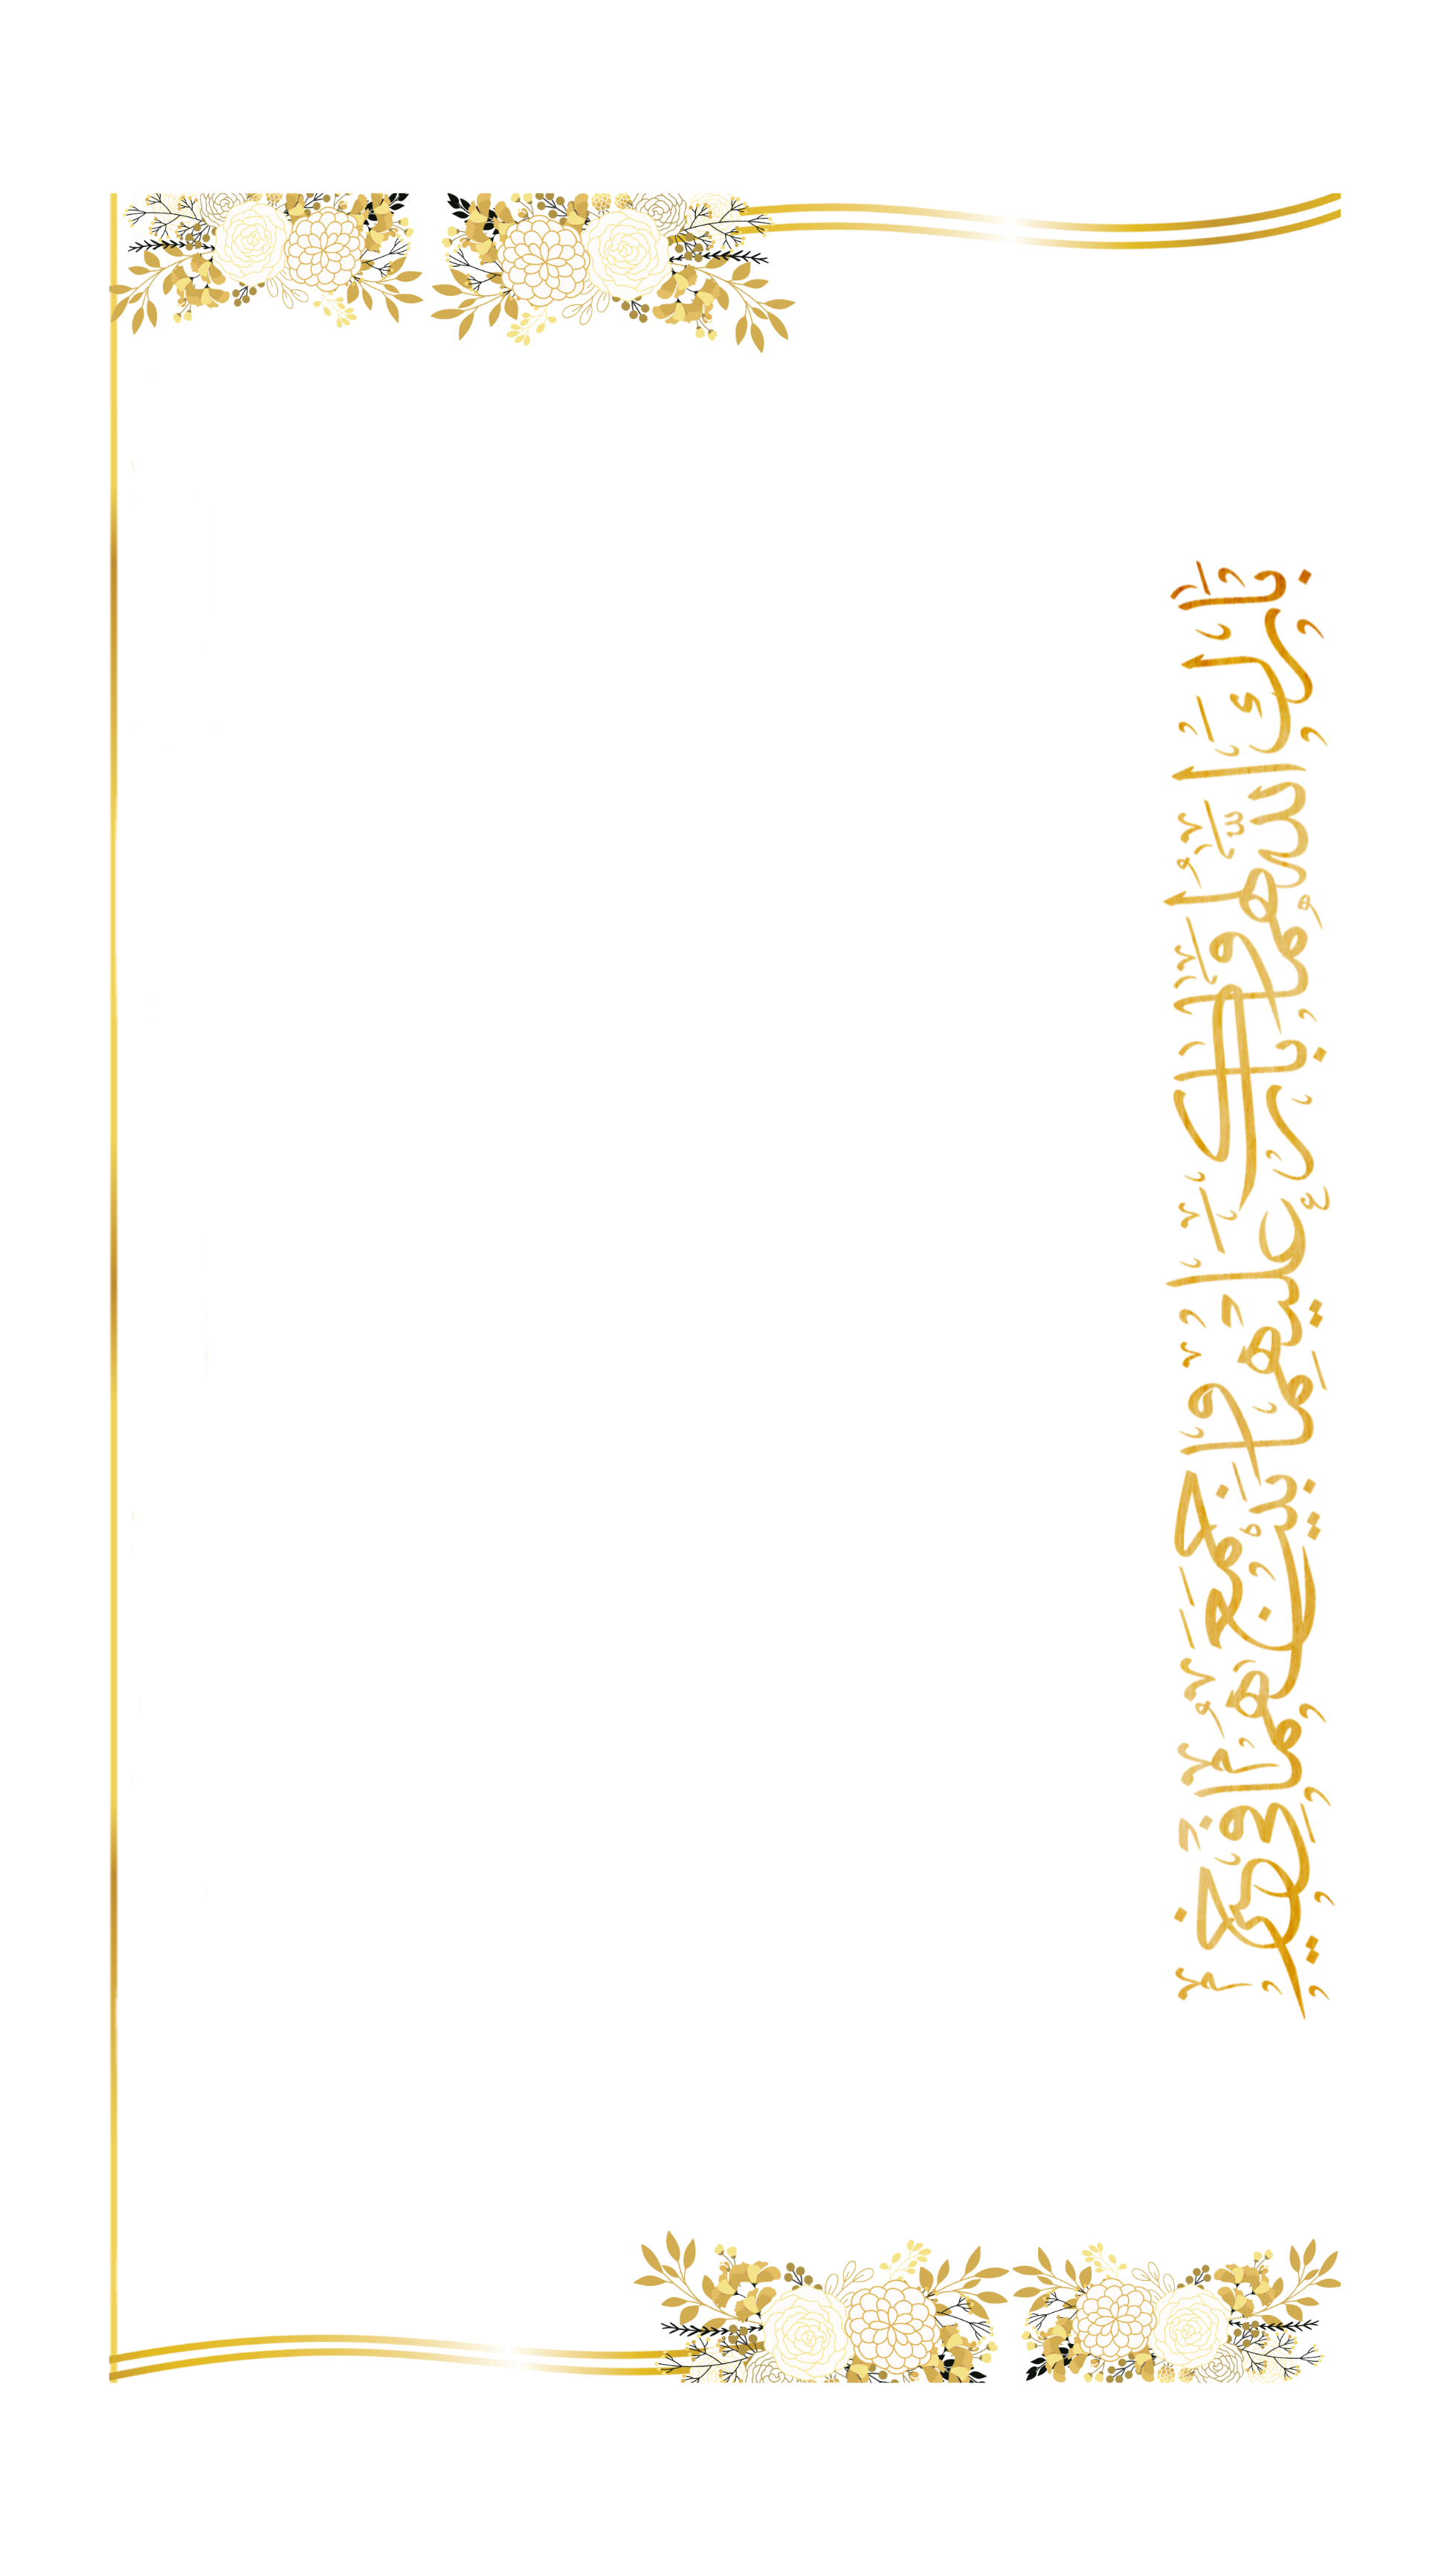 Pin By Amasy On Flower Frame Digital Wedding Invitations Design Wedding Invitation Background Iphone Wallpaper Pattern